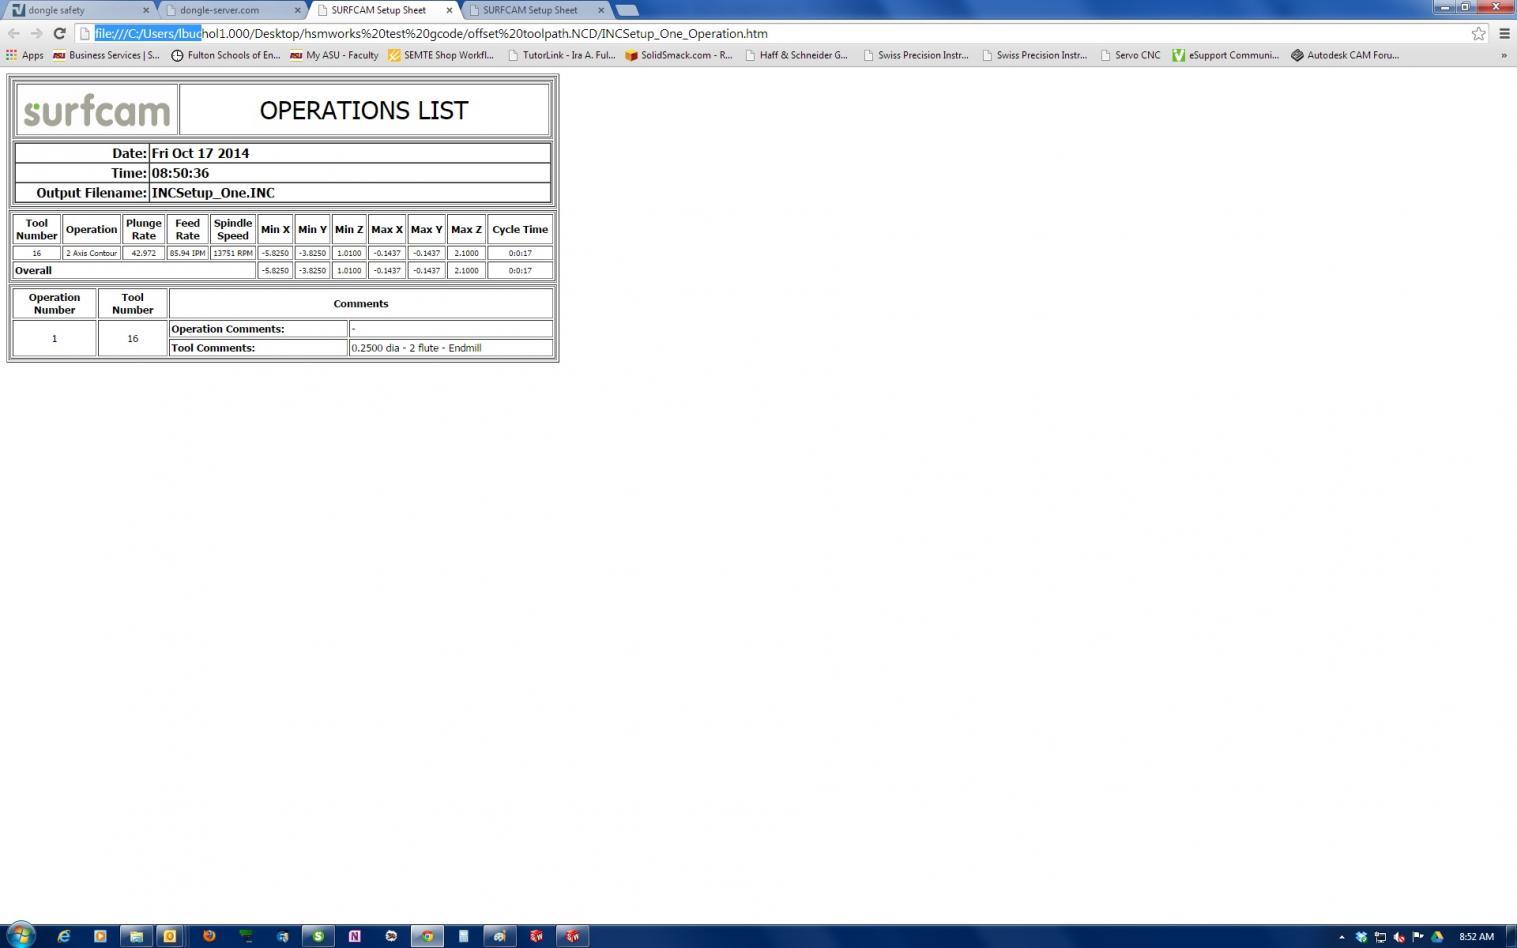 surfcam-setup-sheet-chrome.jpg surfcam-operation-list-chrome.jpg